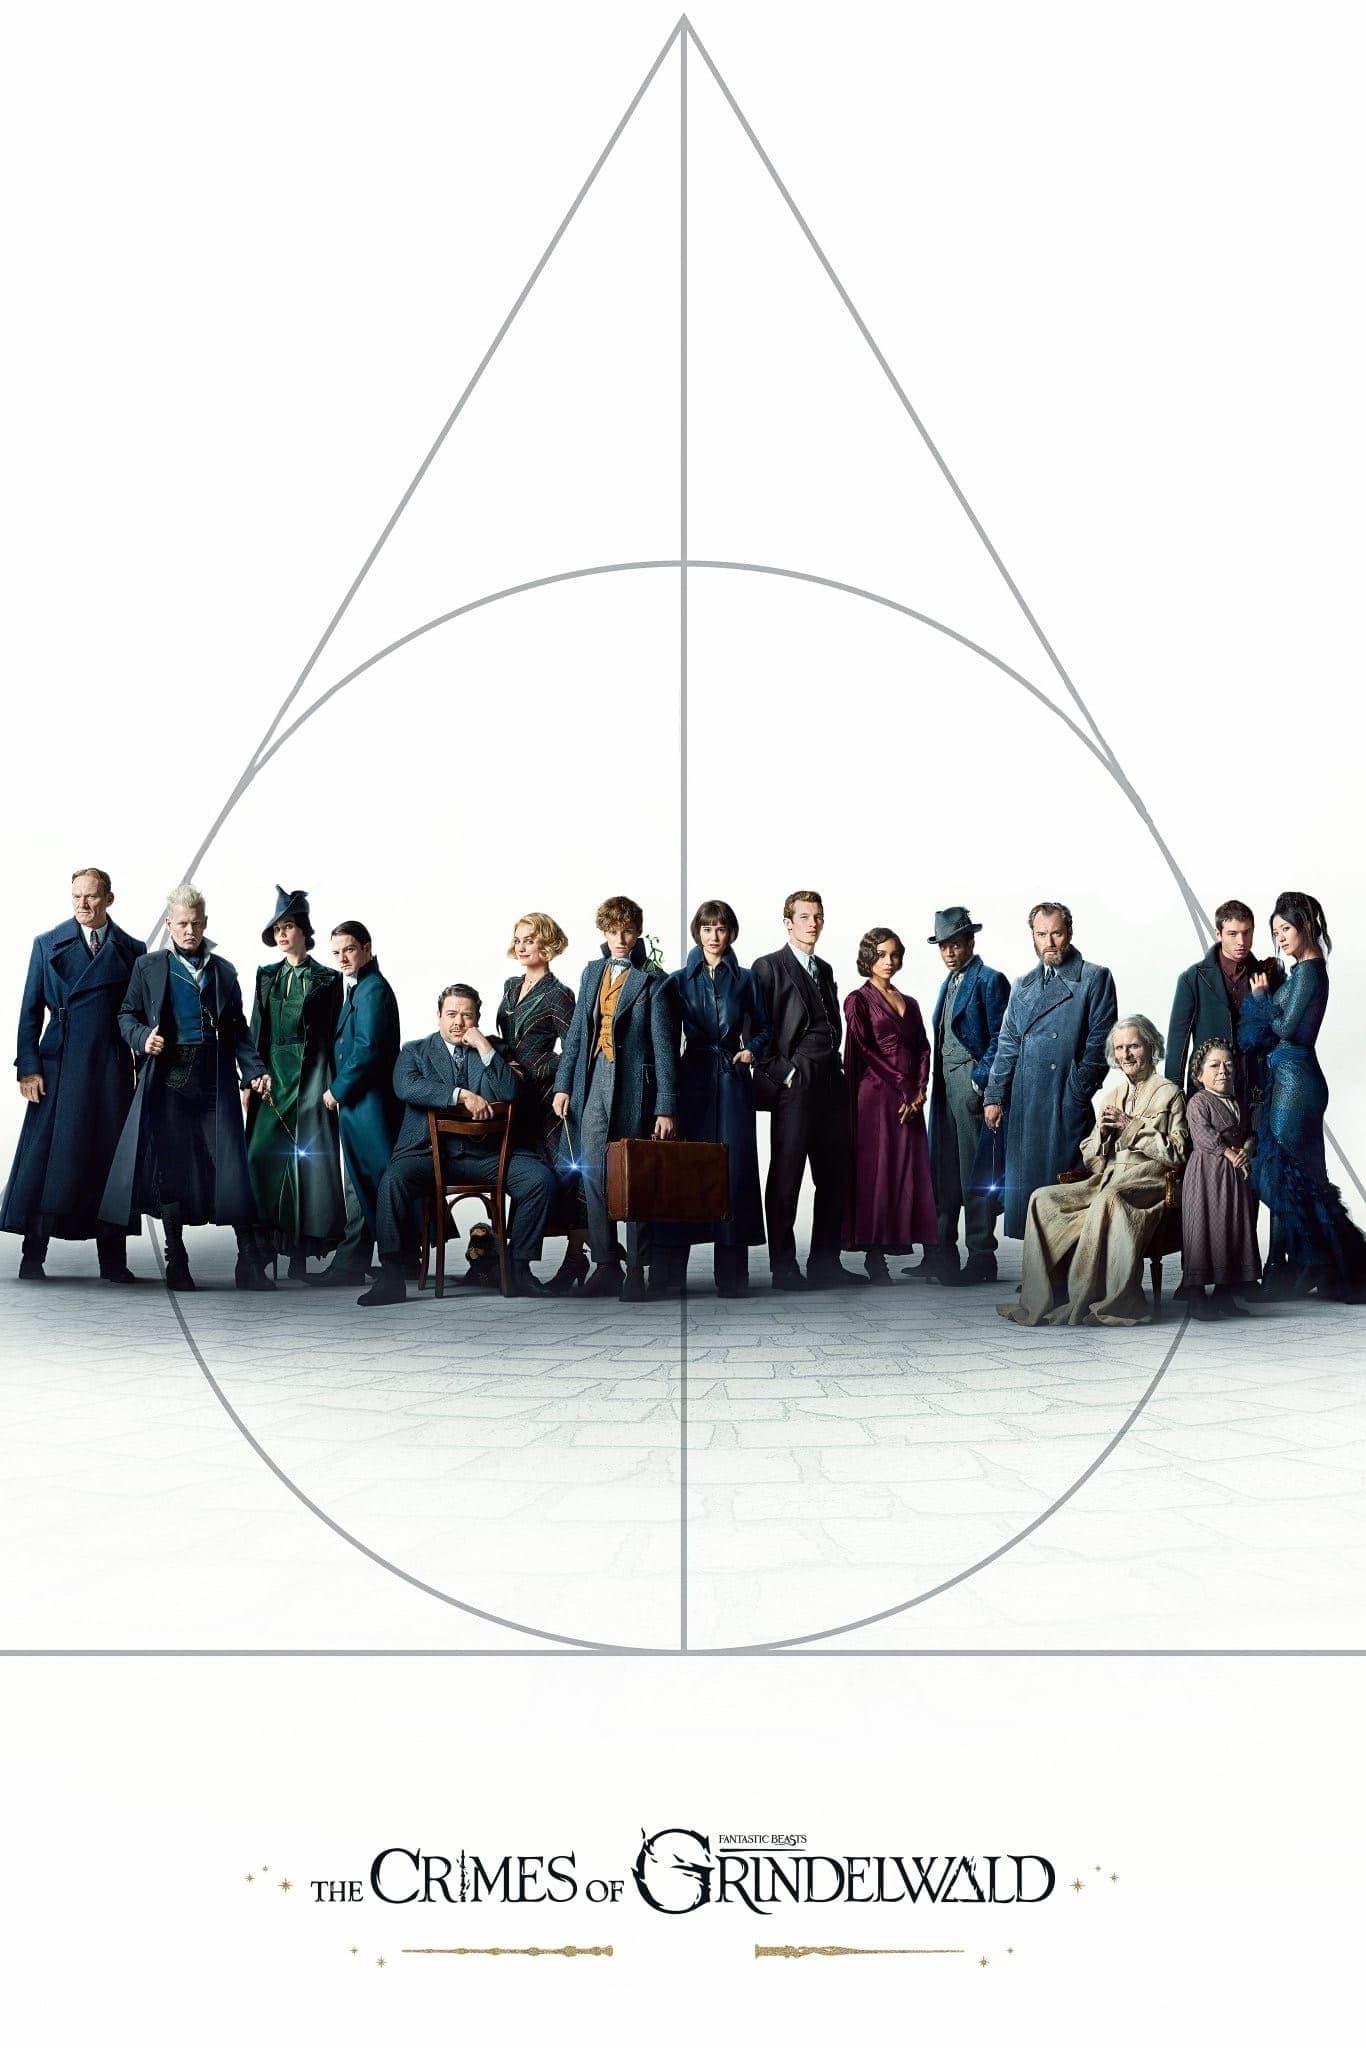 image for Fantastic Beasts: The Crimes of Grindelwald